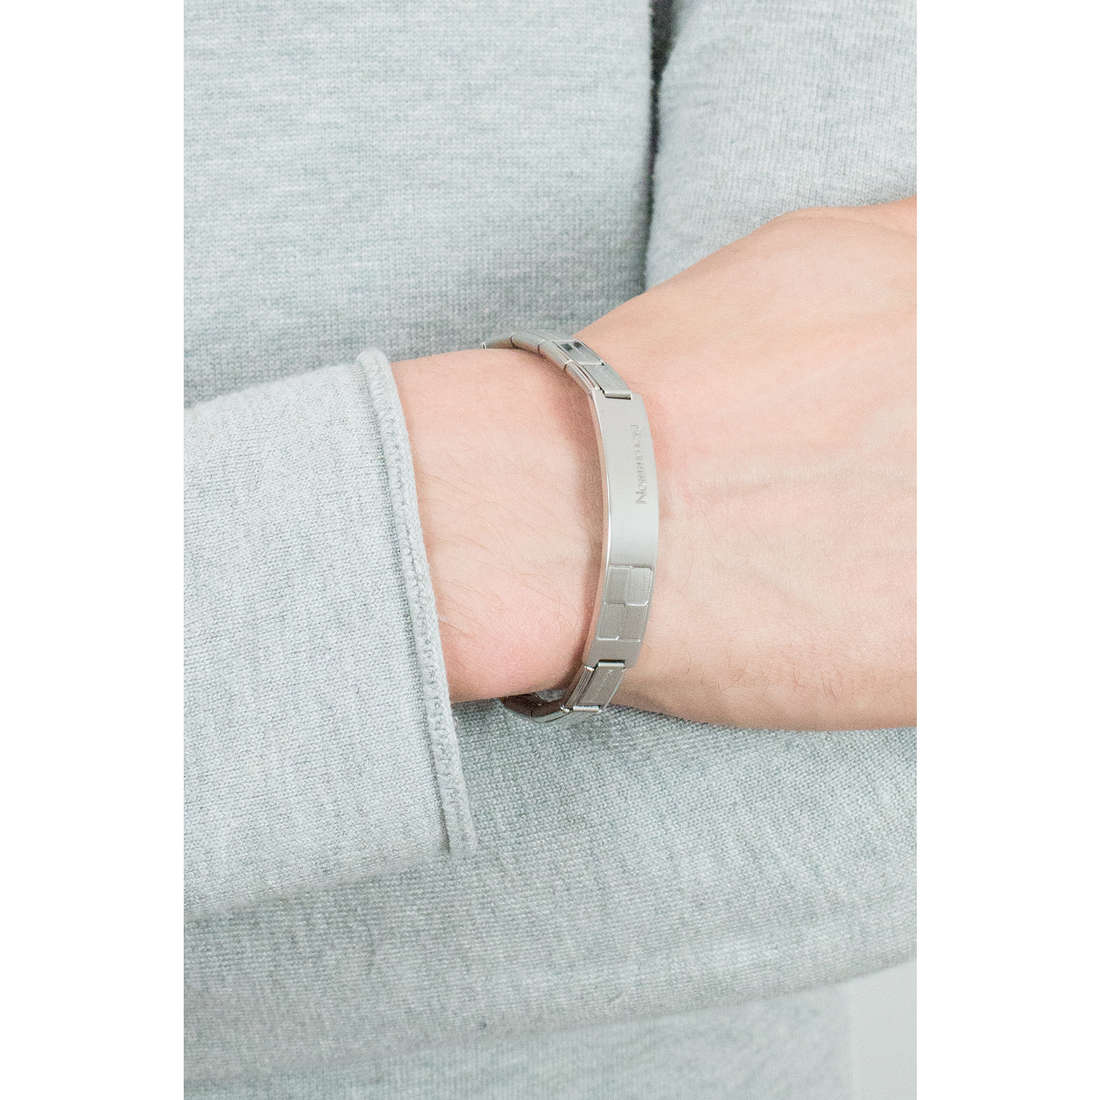 Nomination bracelets Trendsetter homme 021108/006/004 photo wearing